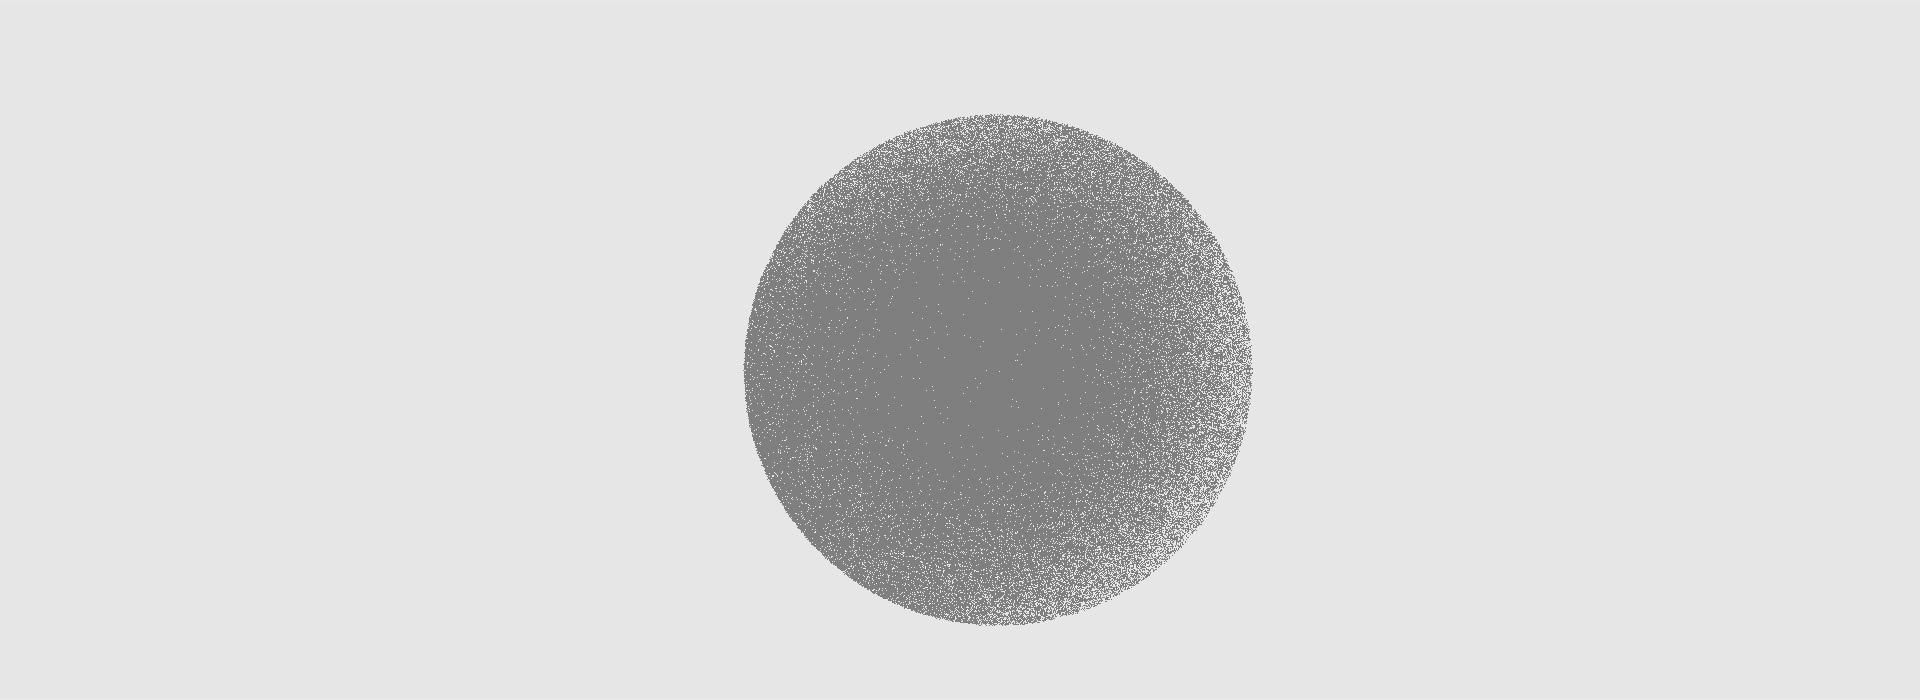 project-detail-bg-01.jpg